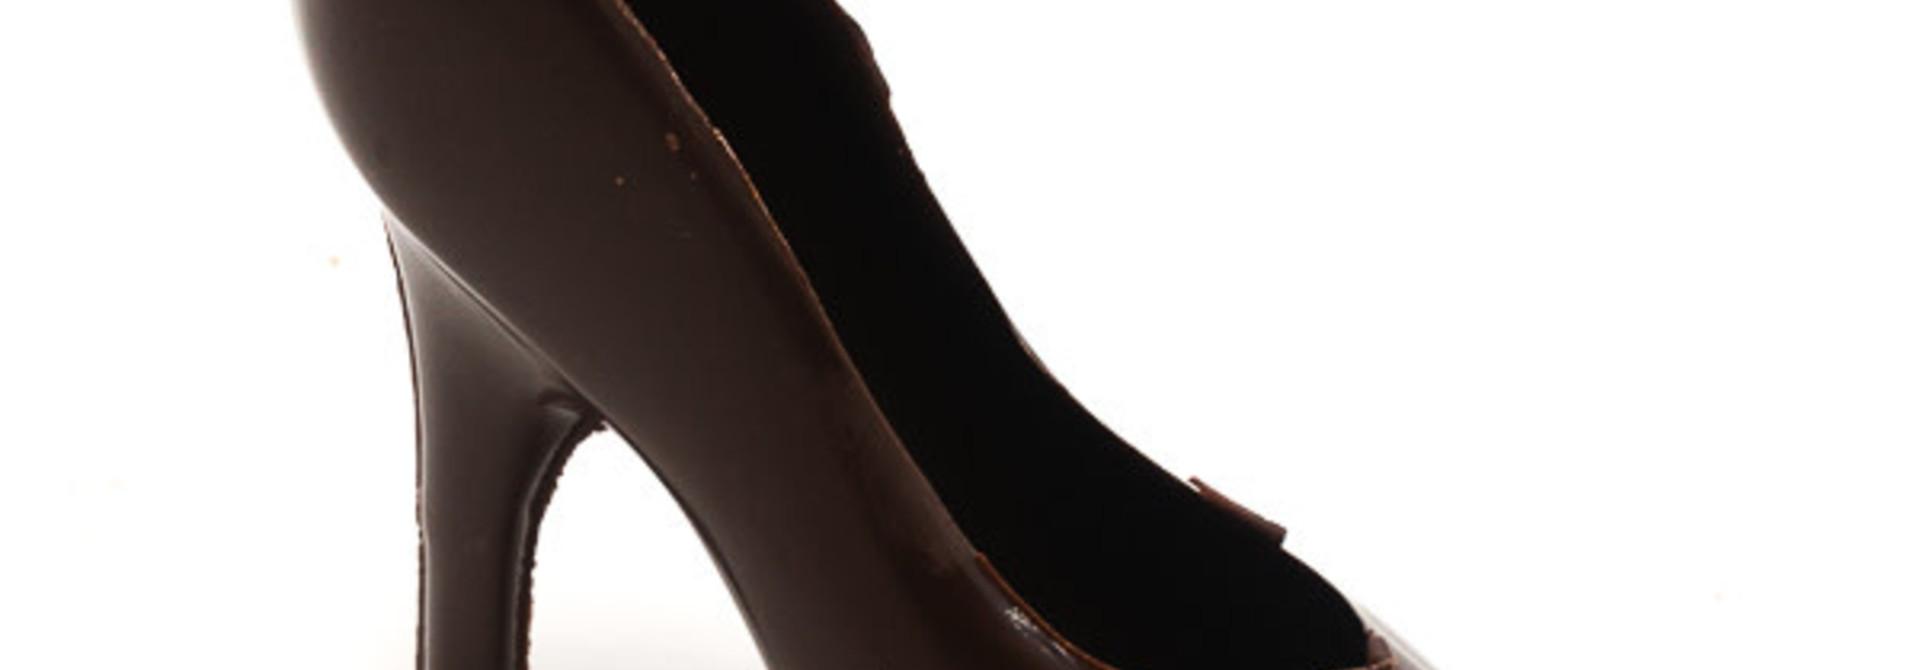 Small high heels (dark)